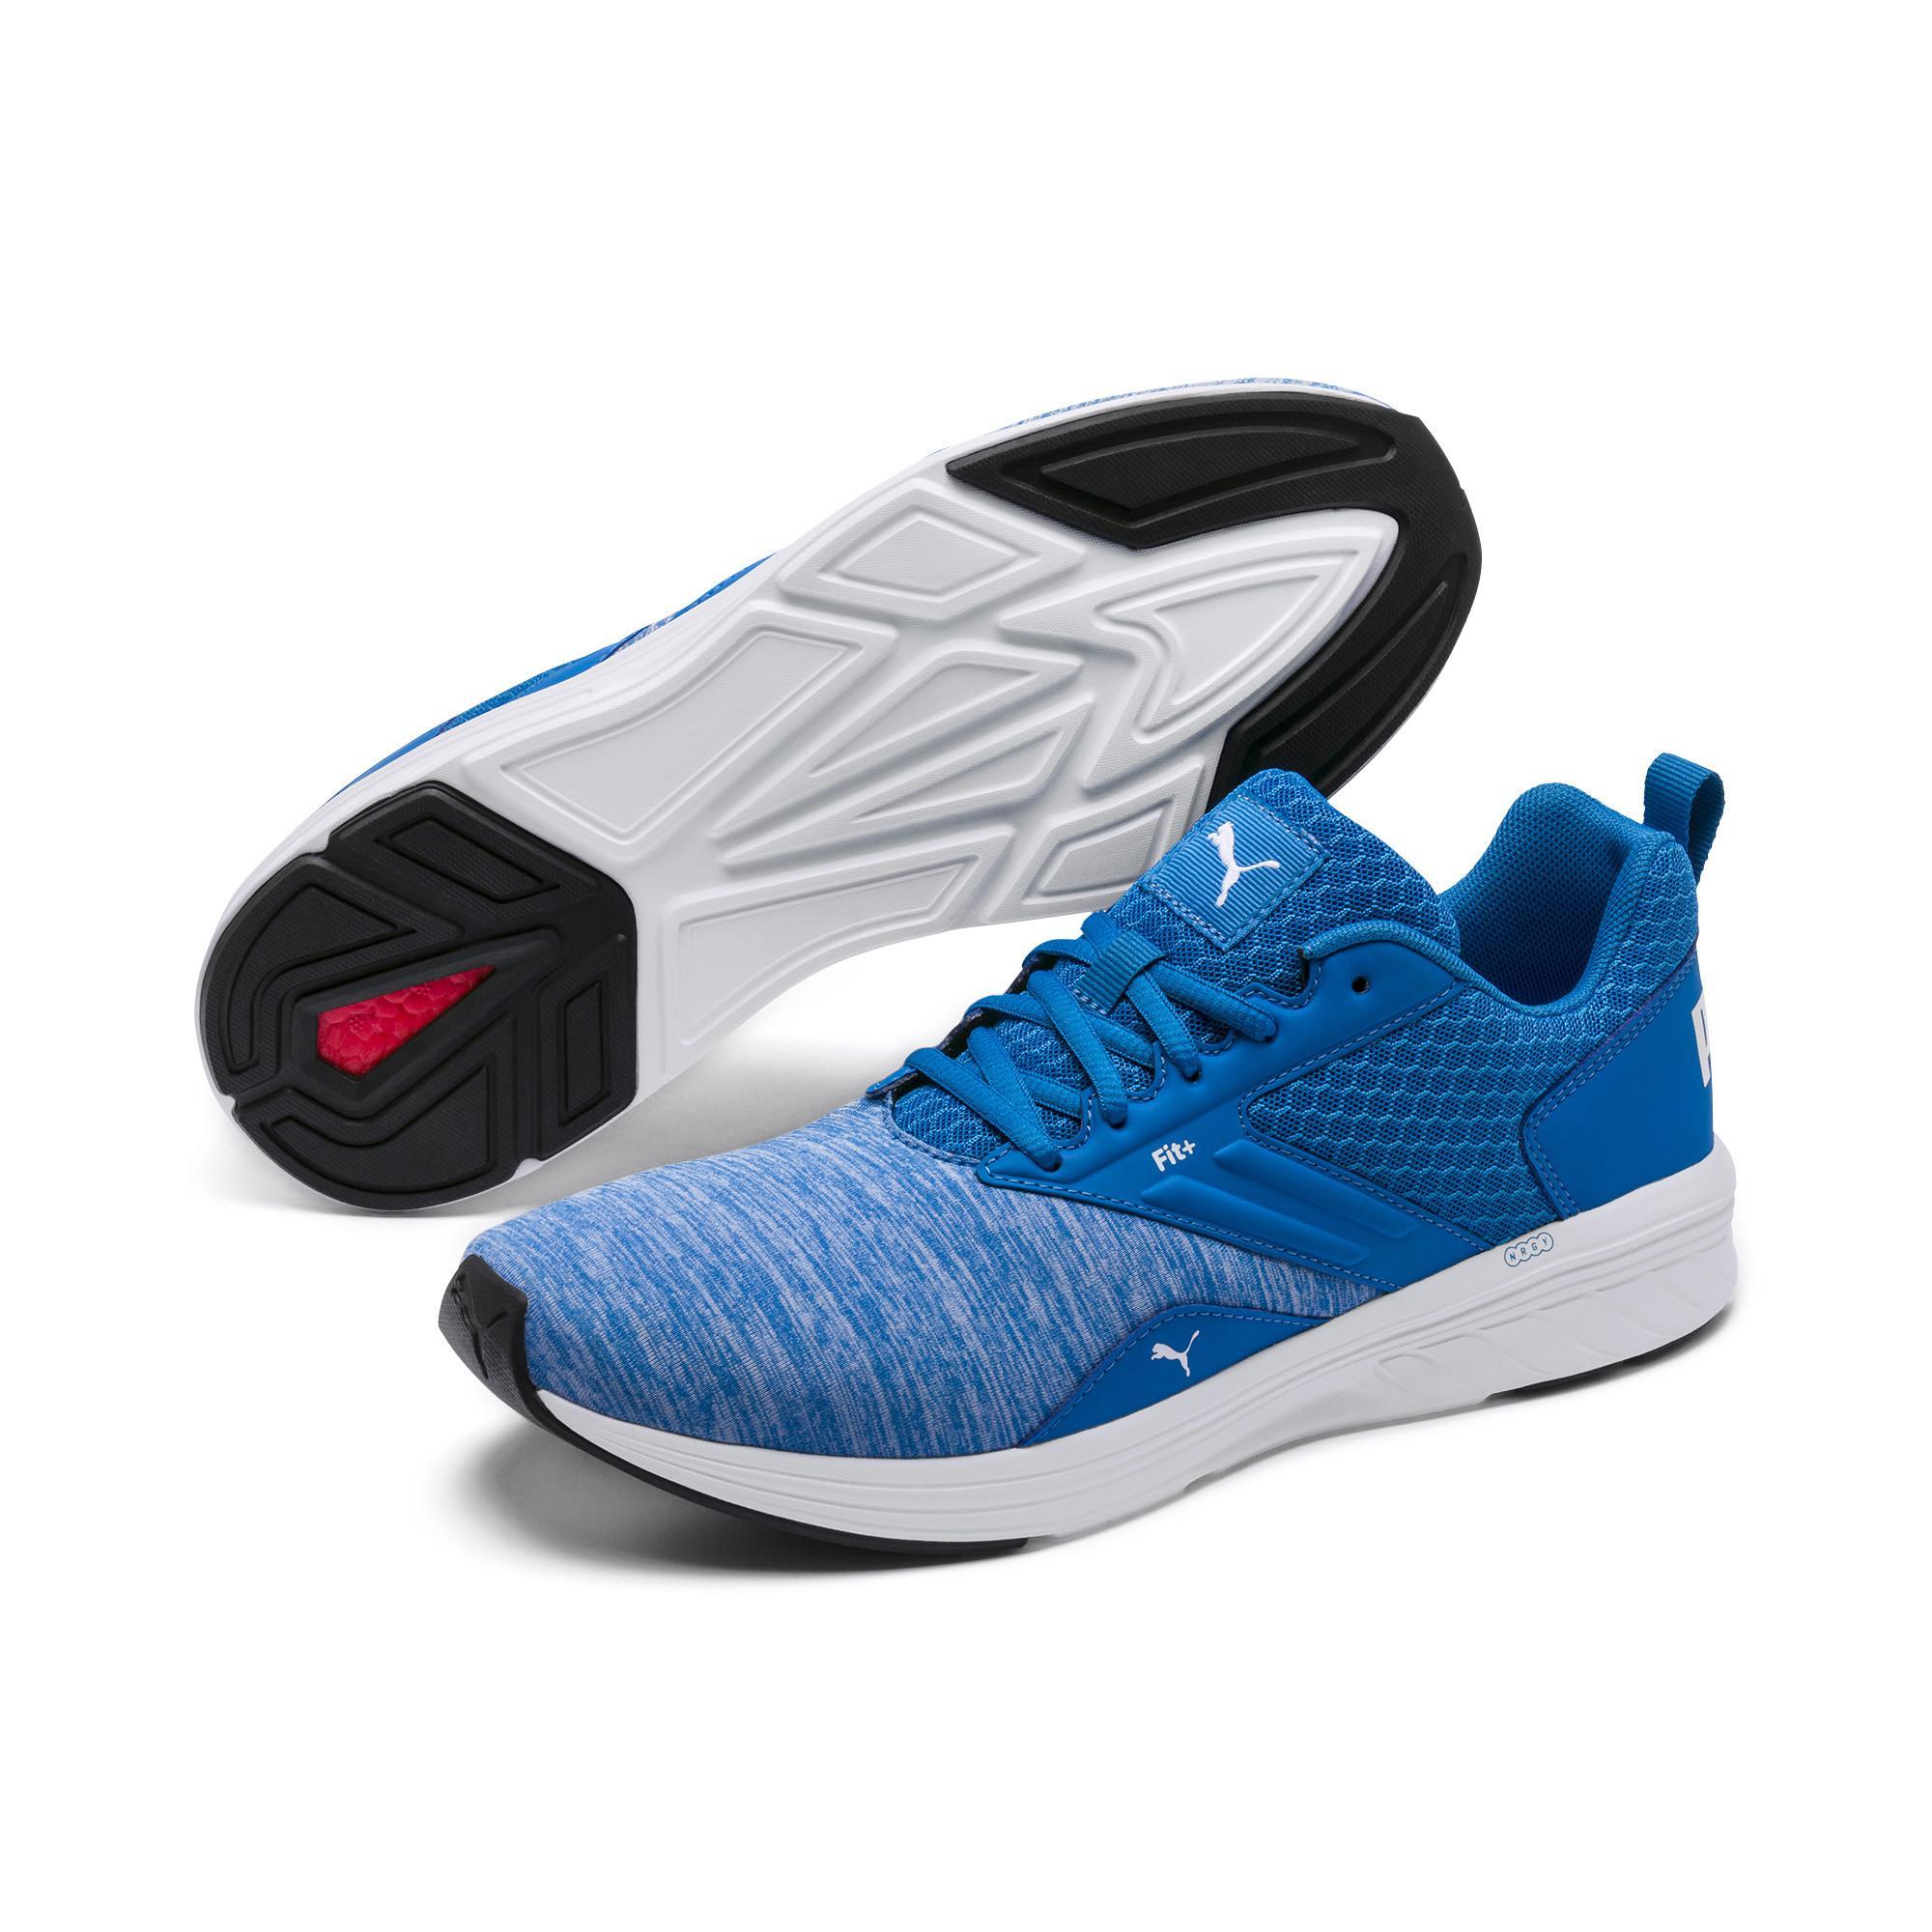 c617677fed46 PUMA - Blue Nrgy Comet Running Shoes for Men - Lyst. View fullscreen